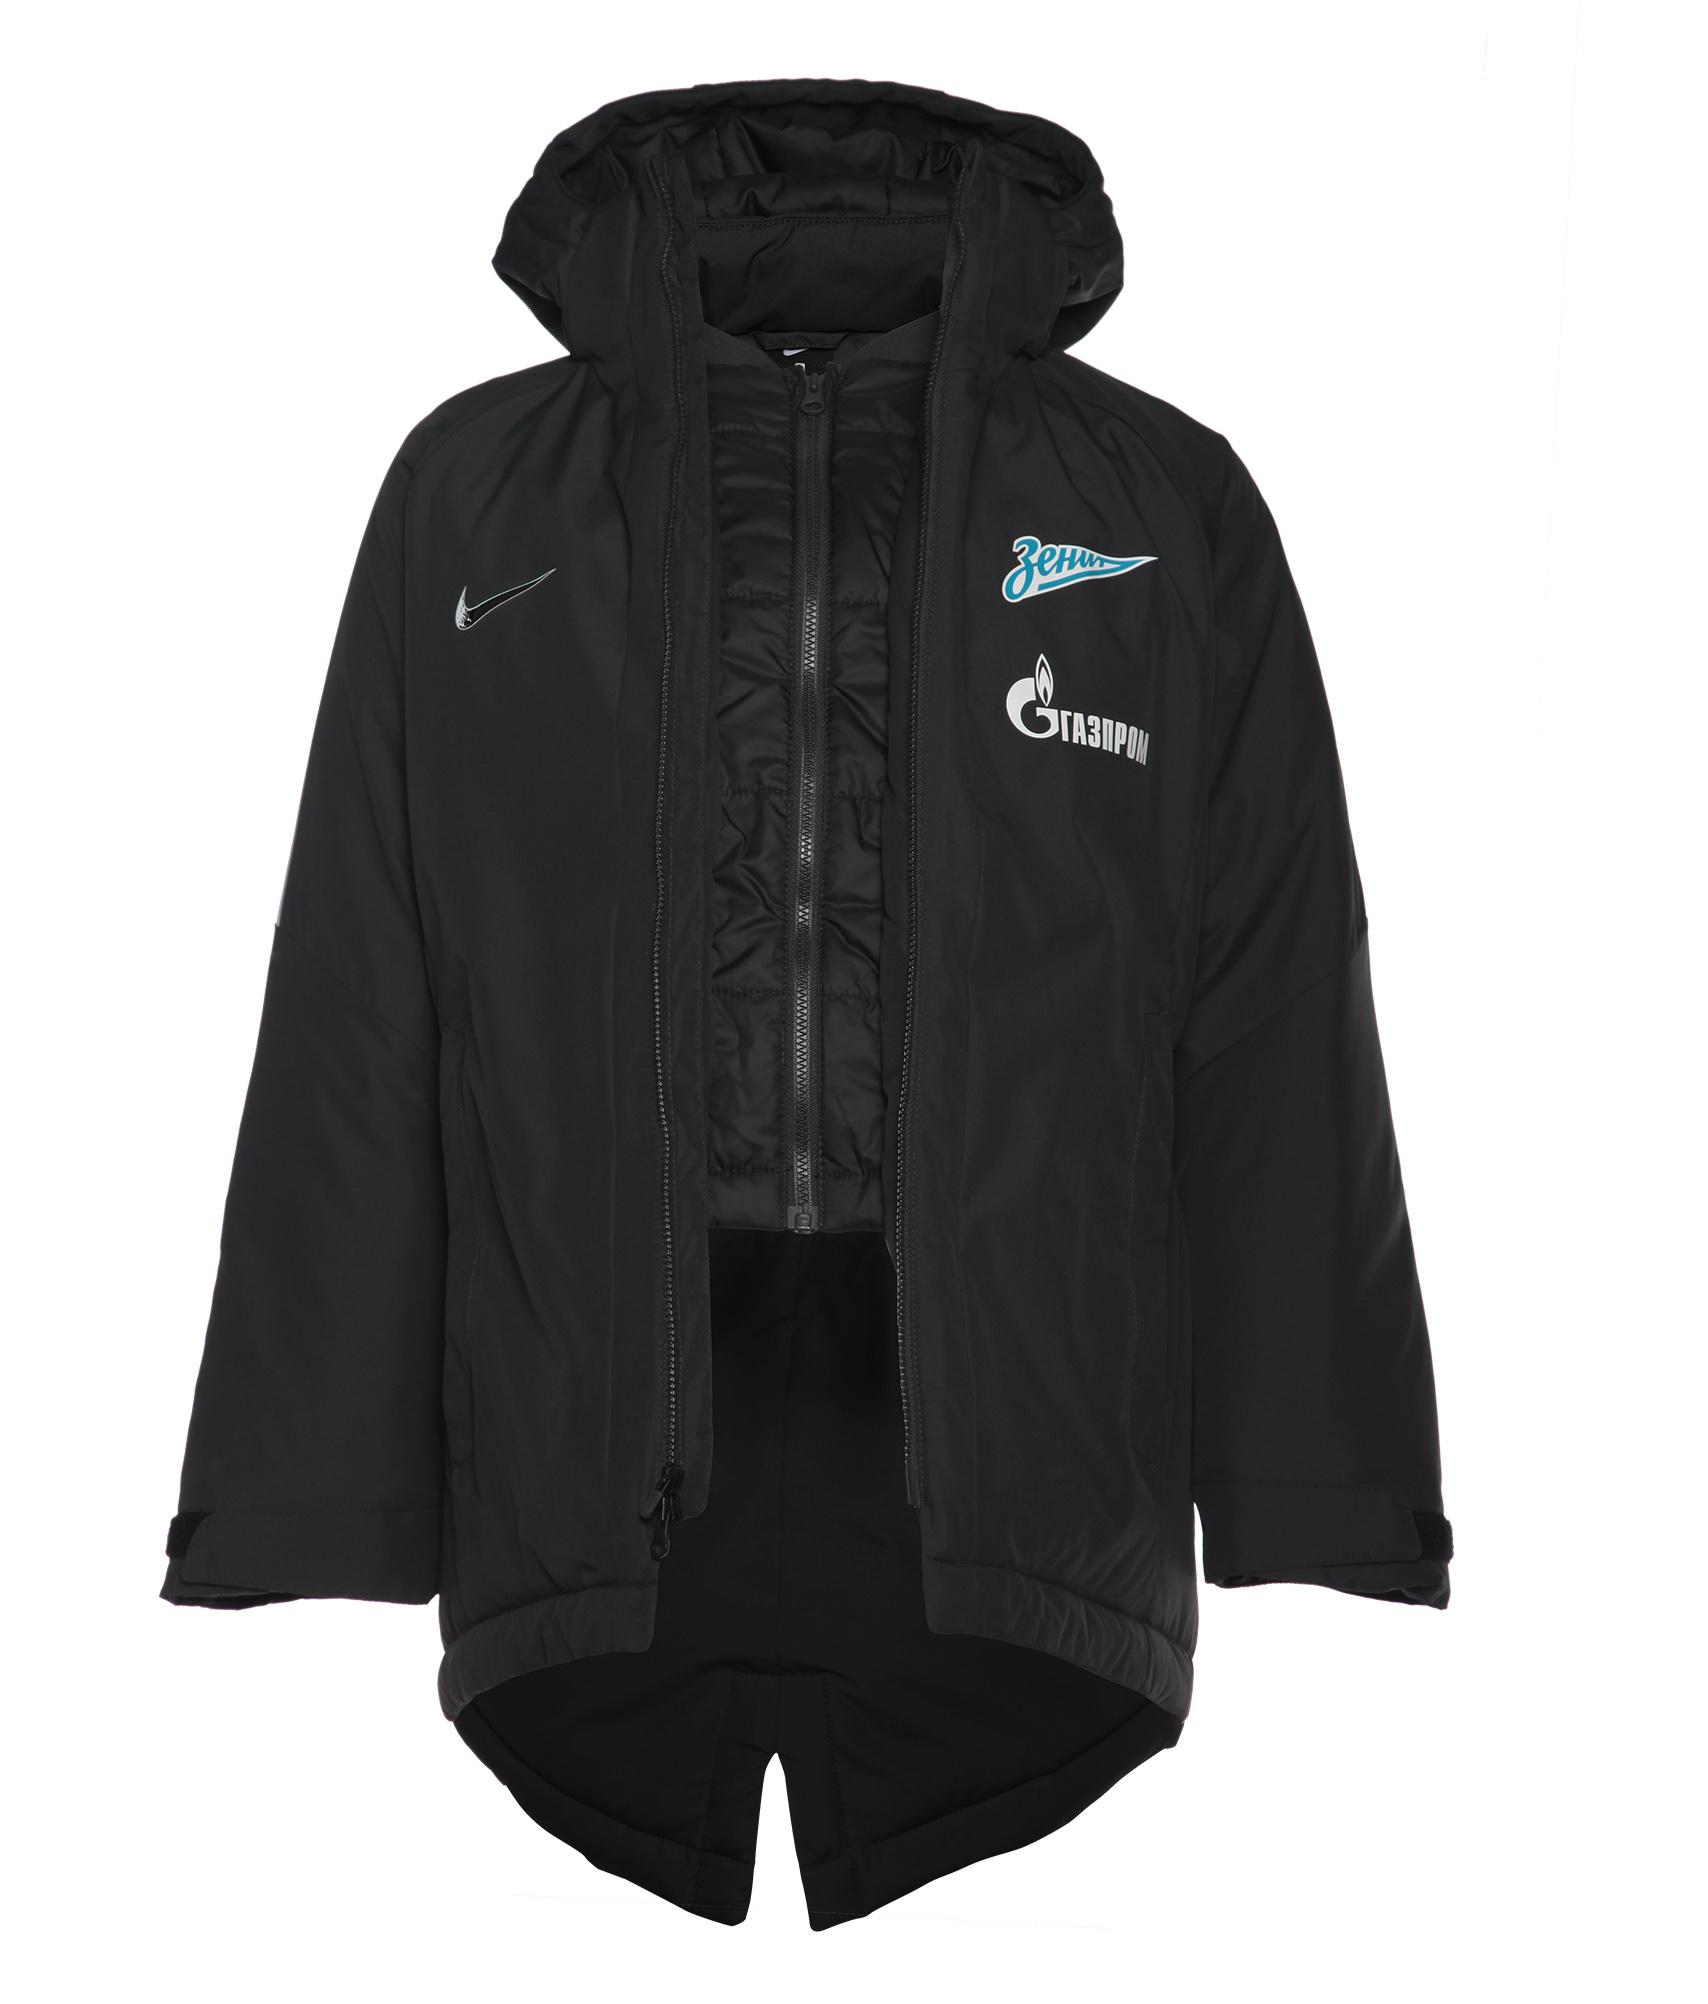 цена на Куртка зимняя подростковая Nike, Размер-M